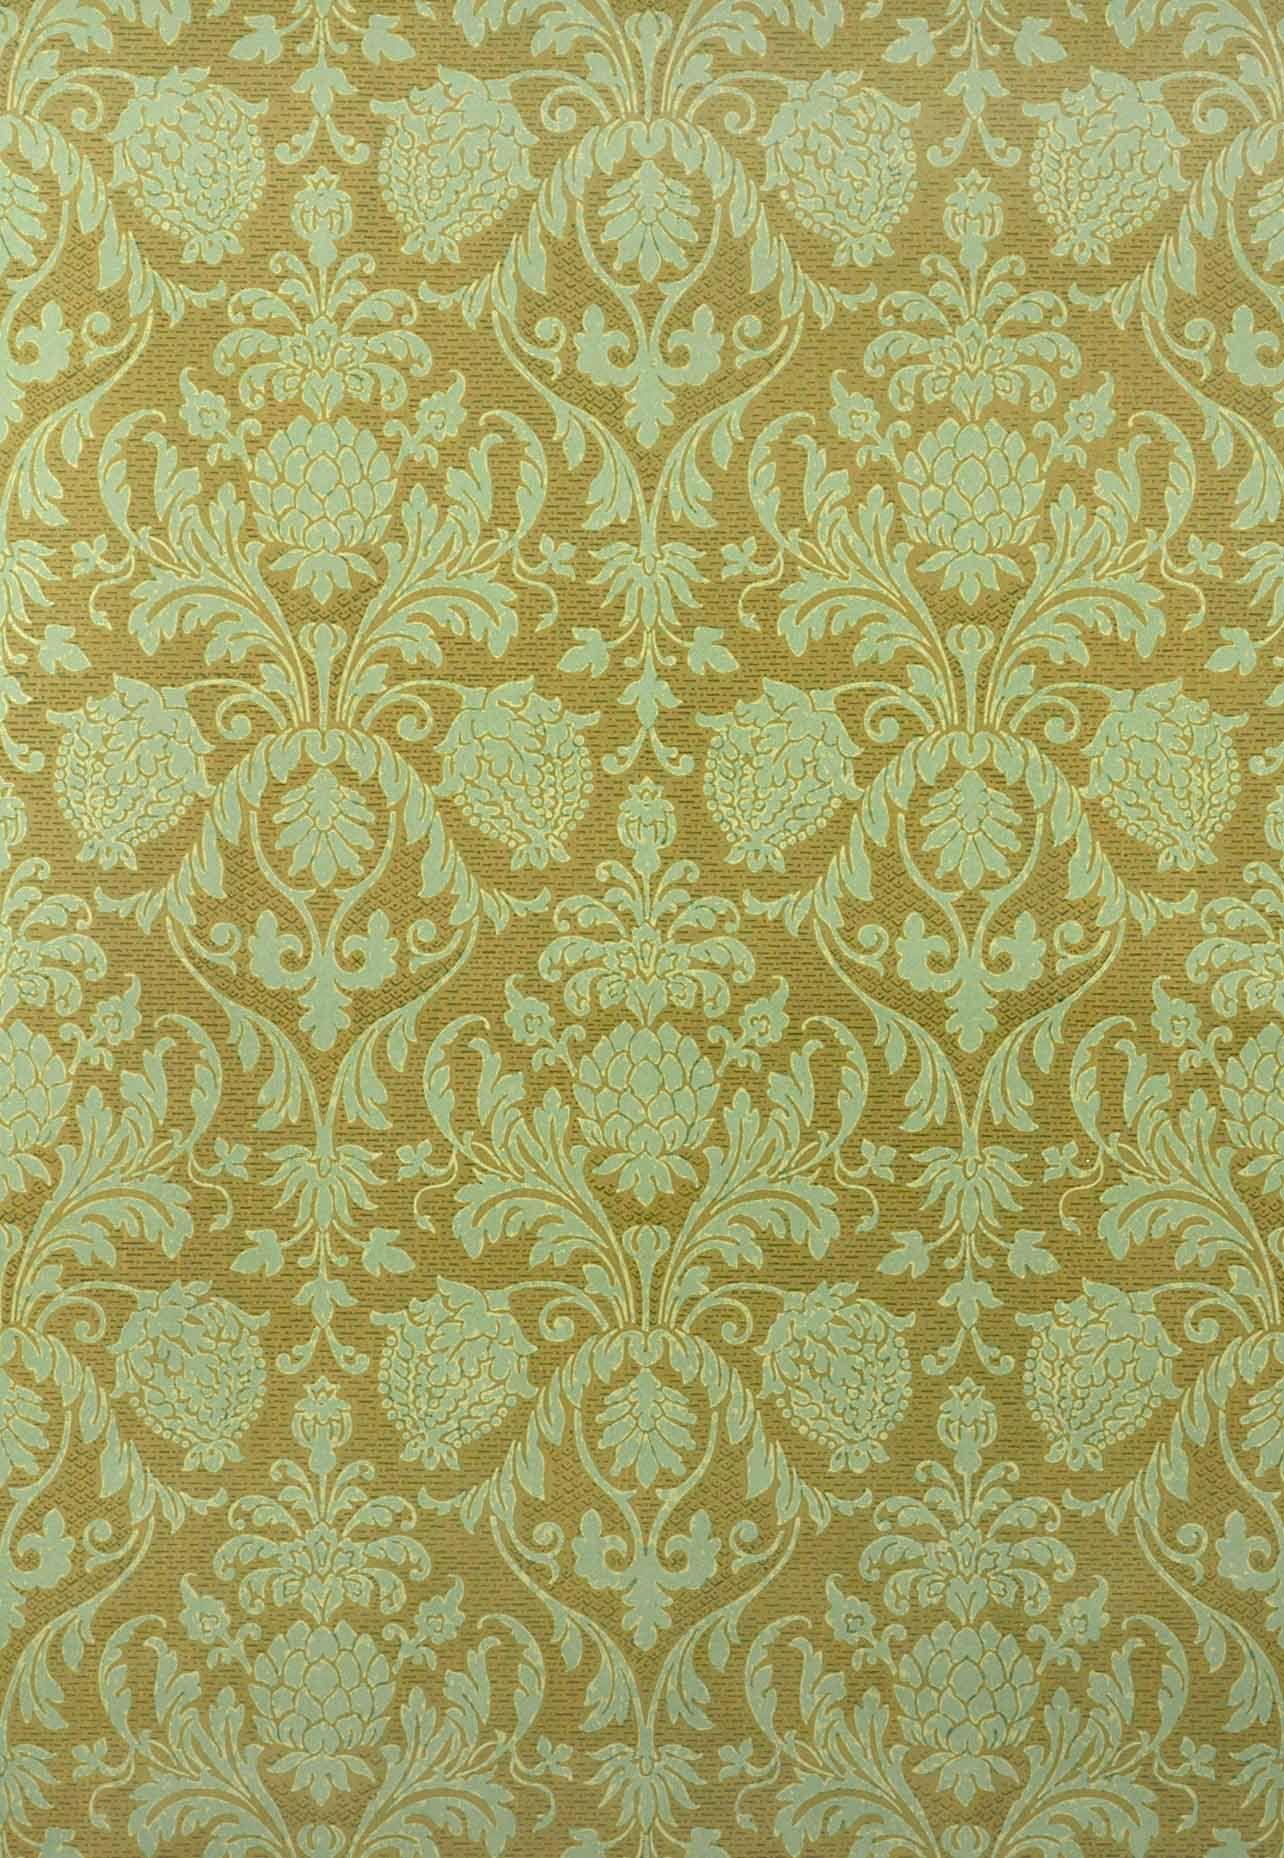 tapeten historische tapeten hembus gmbh ca 1870 stoffe tapeten bord ren teppiche. Black Bedroom Furniture Sets. Home Design Ideas